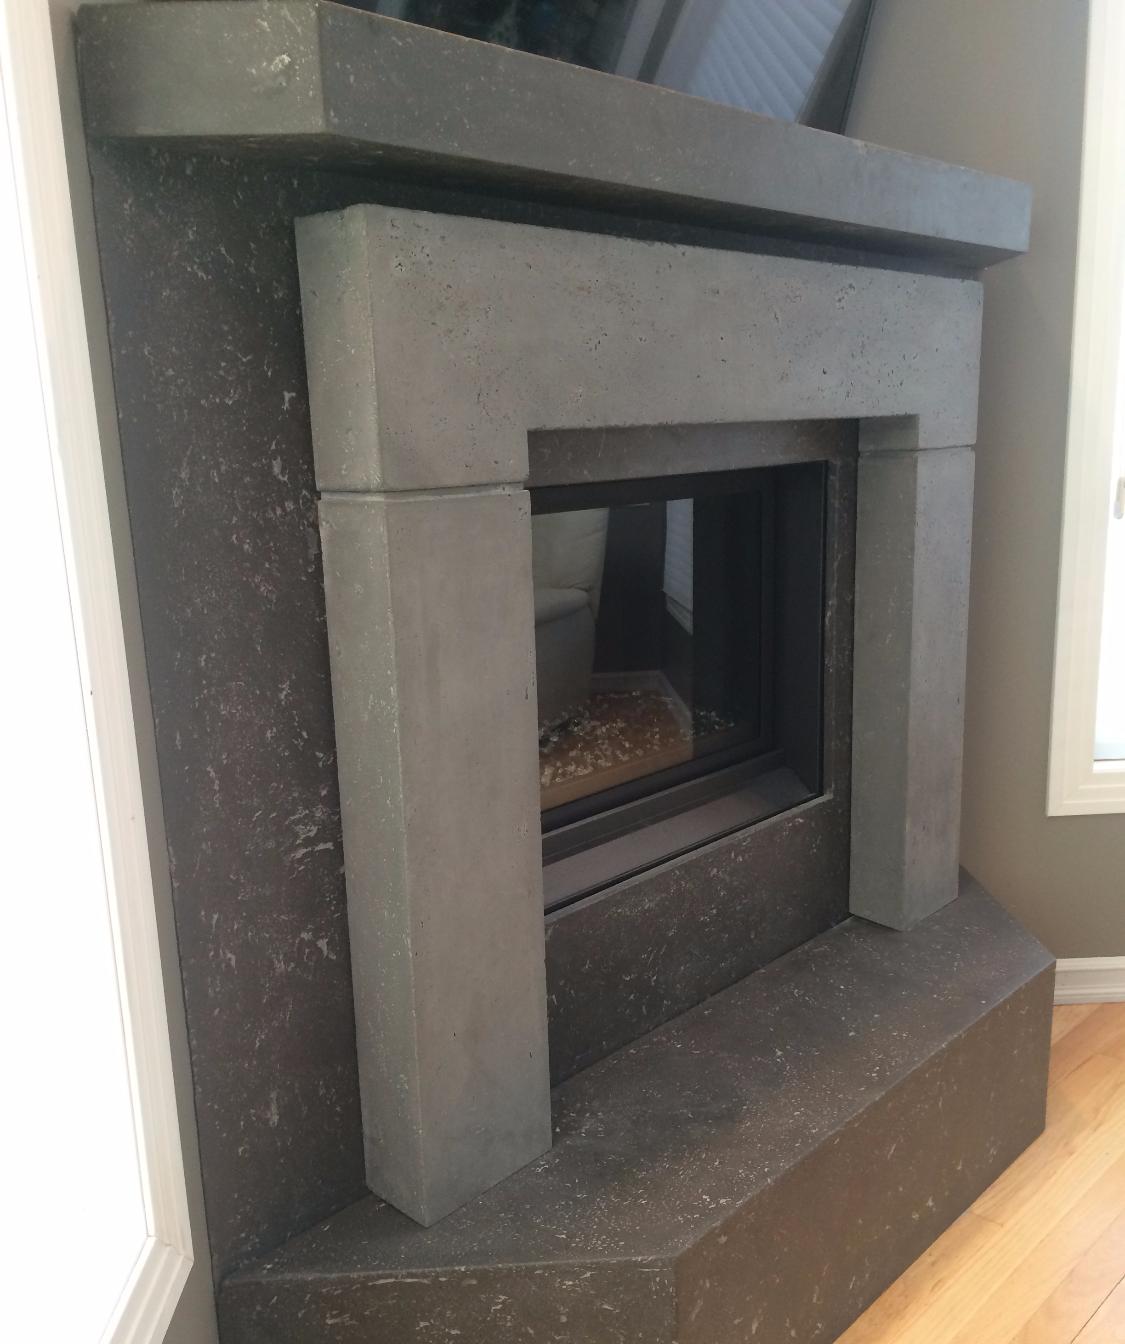 2 Tone Fireplace